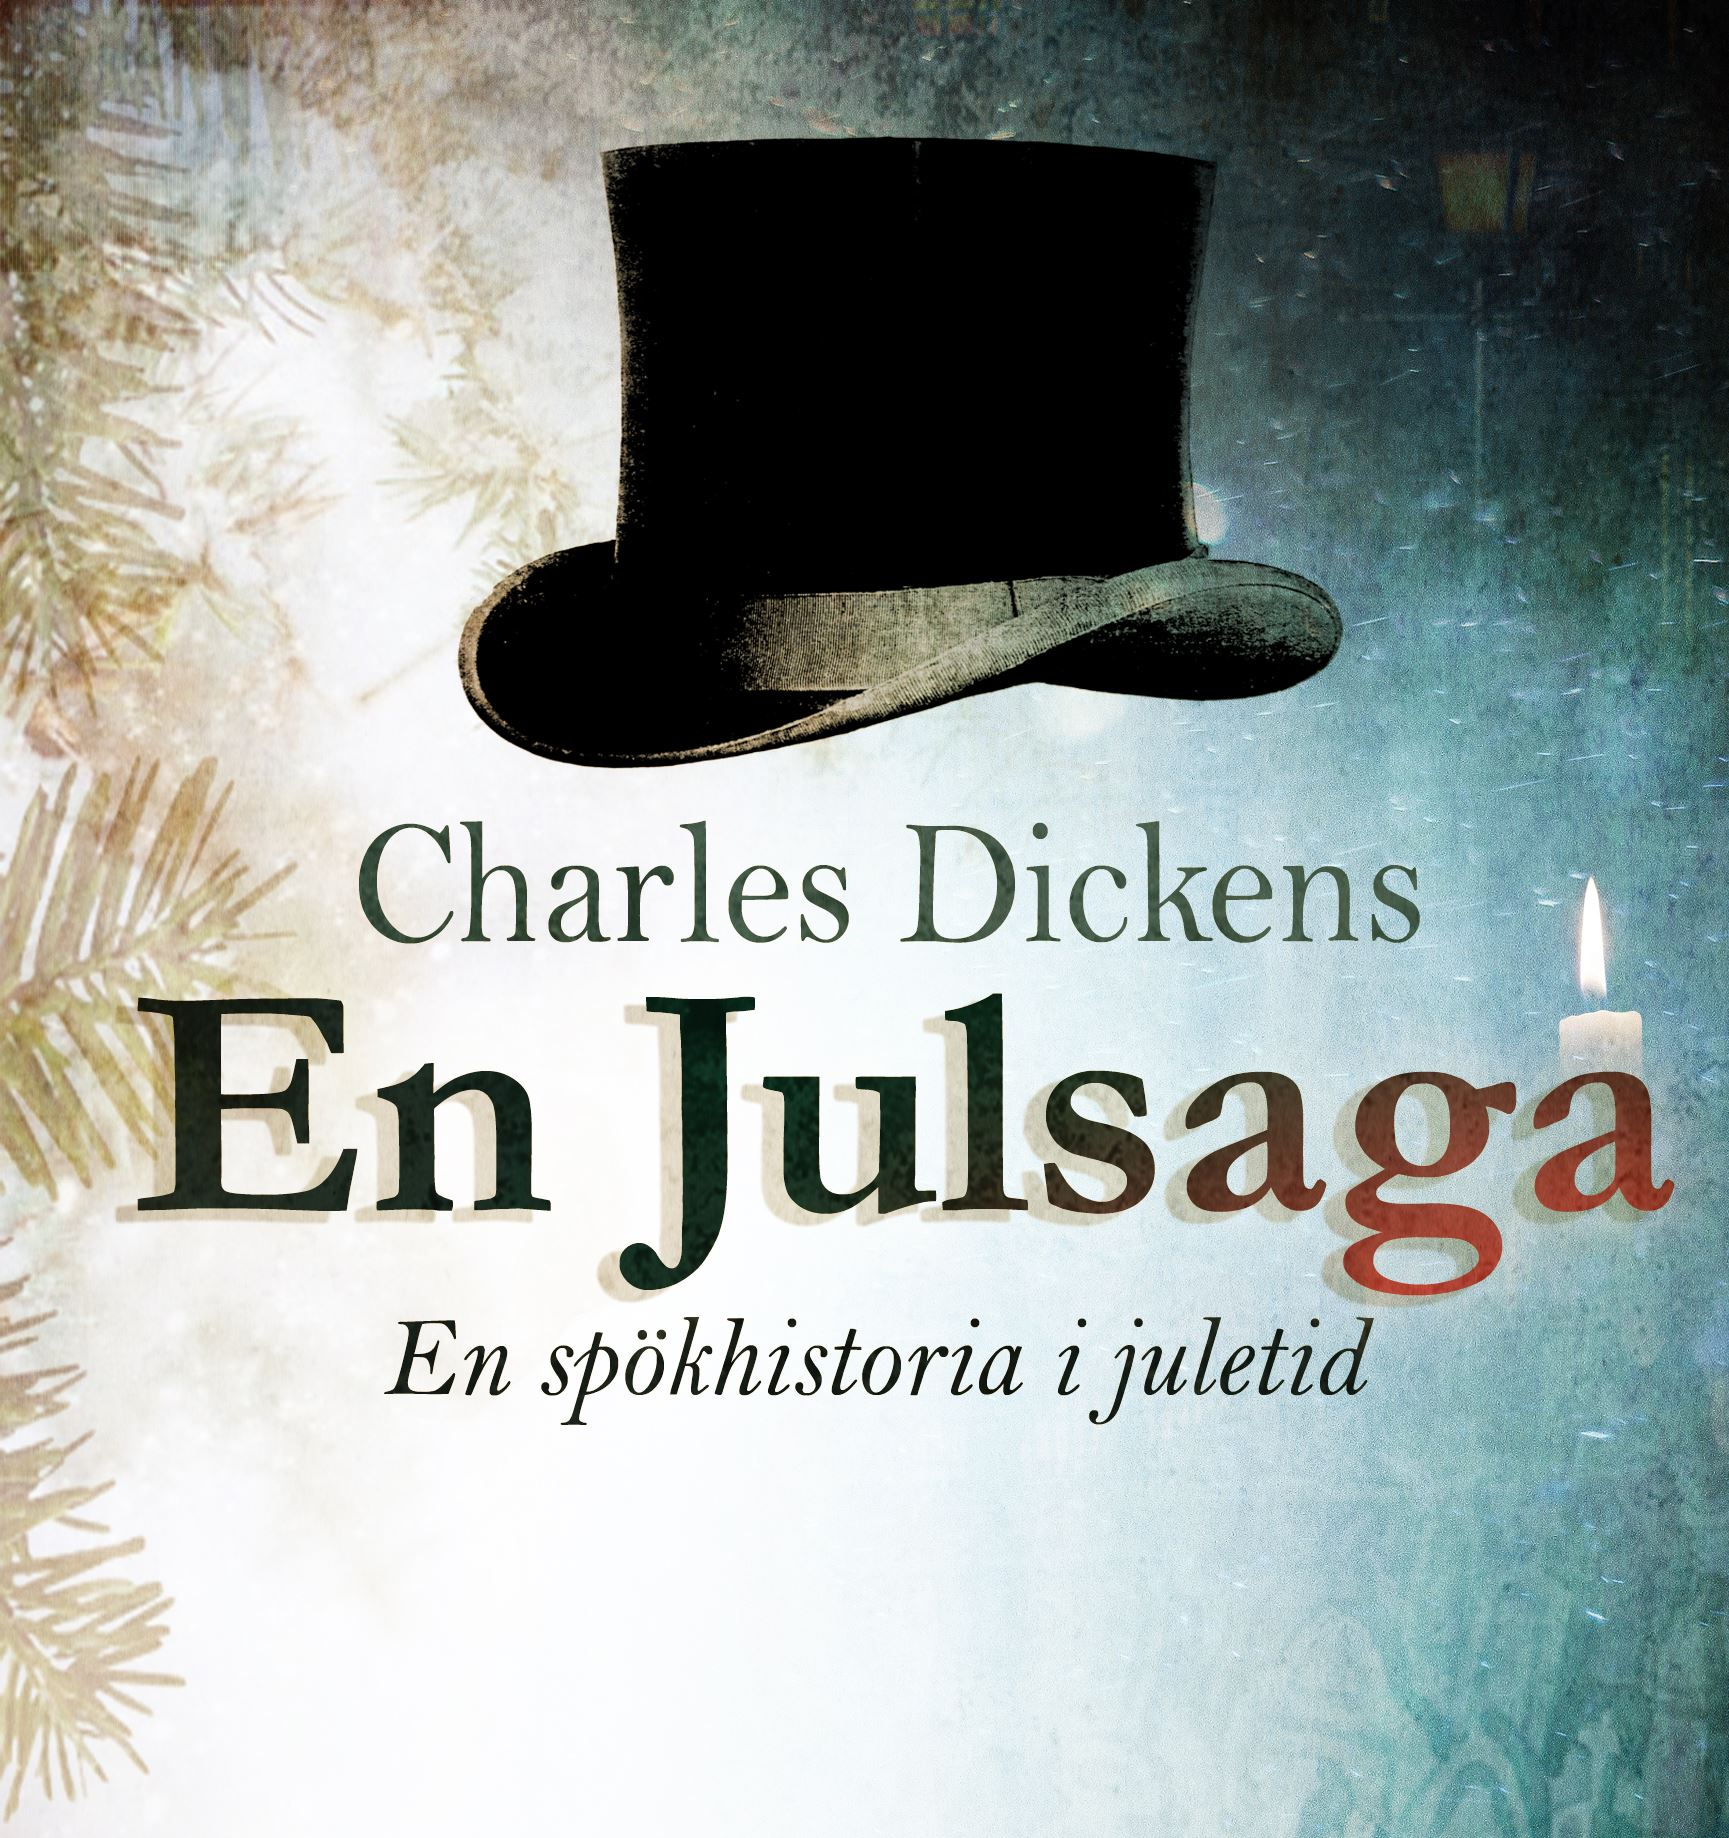 Charles Dickens En Julsaga